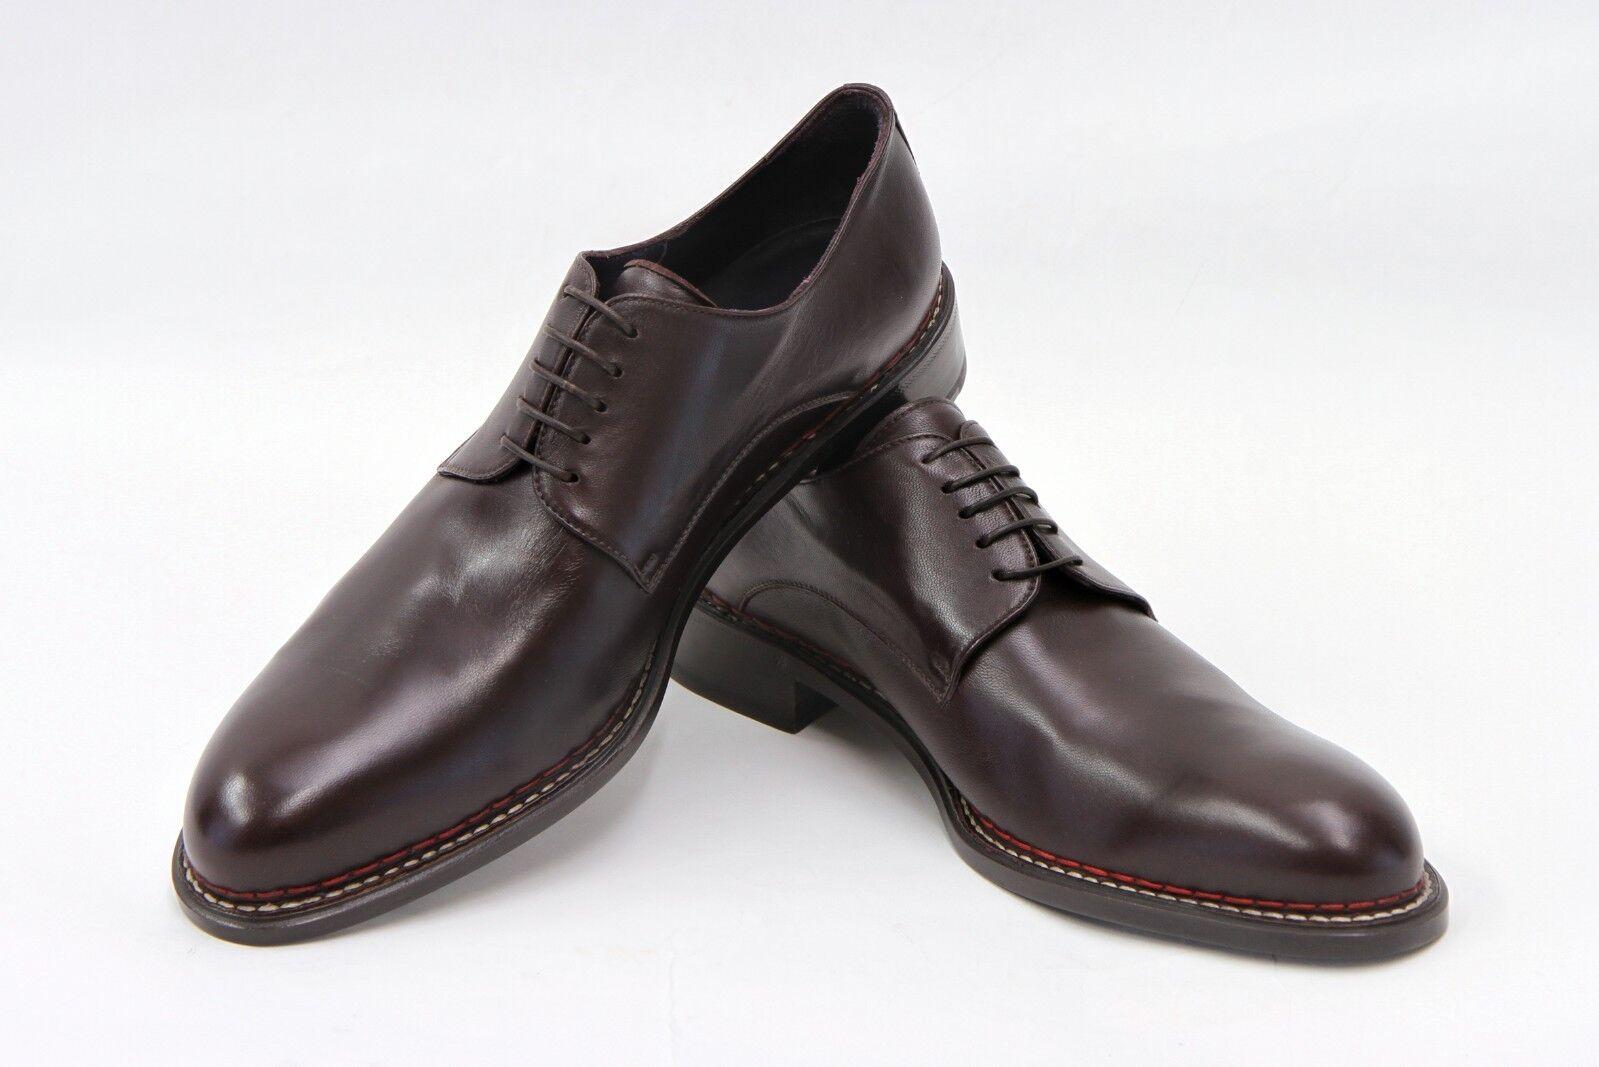 vendita calda NWOB ISAIA NAPOLI Uomo 100% LEATHER LACE-UP DERBY DERBY DERBY DRESS scarpe Dimensione 10  11.5US  più economico